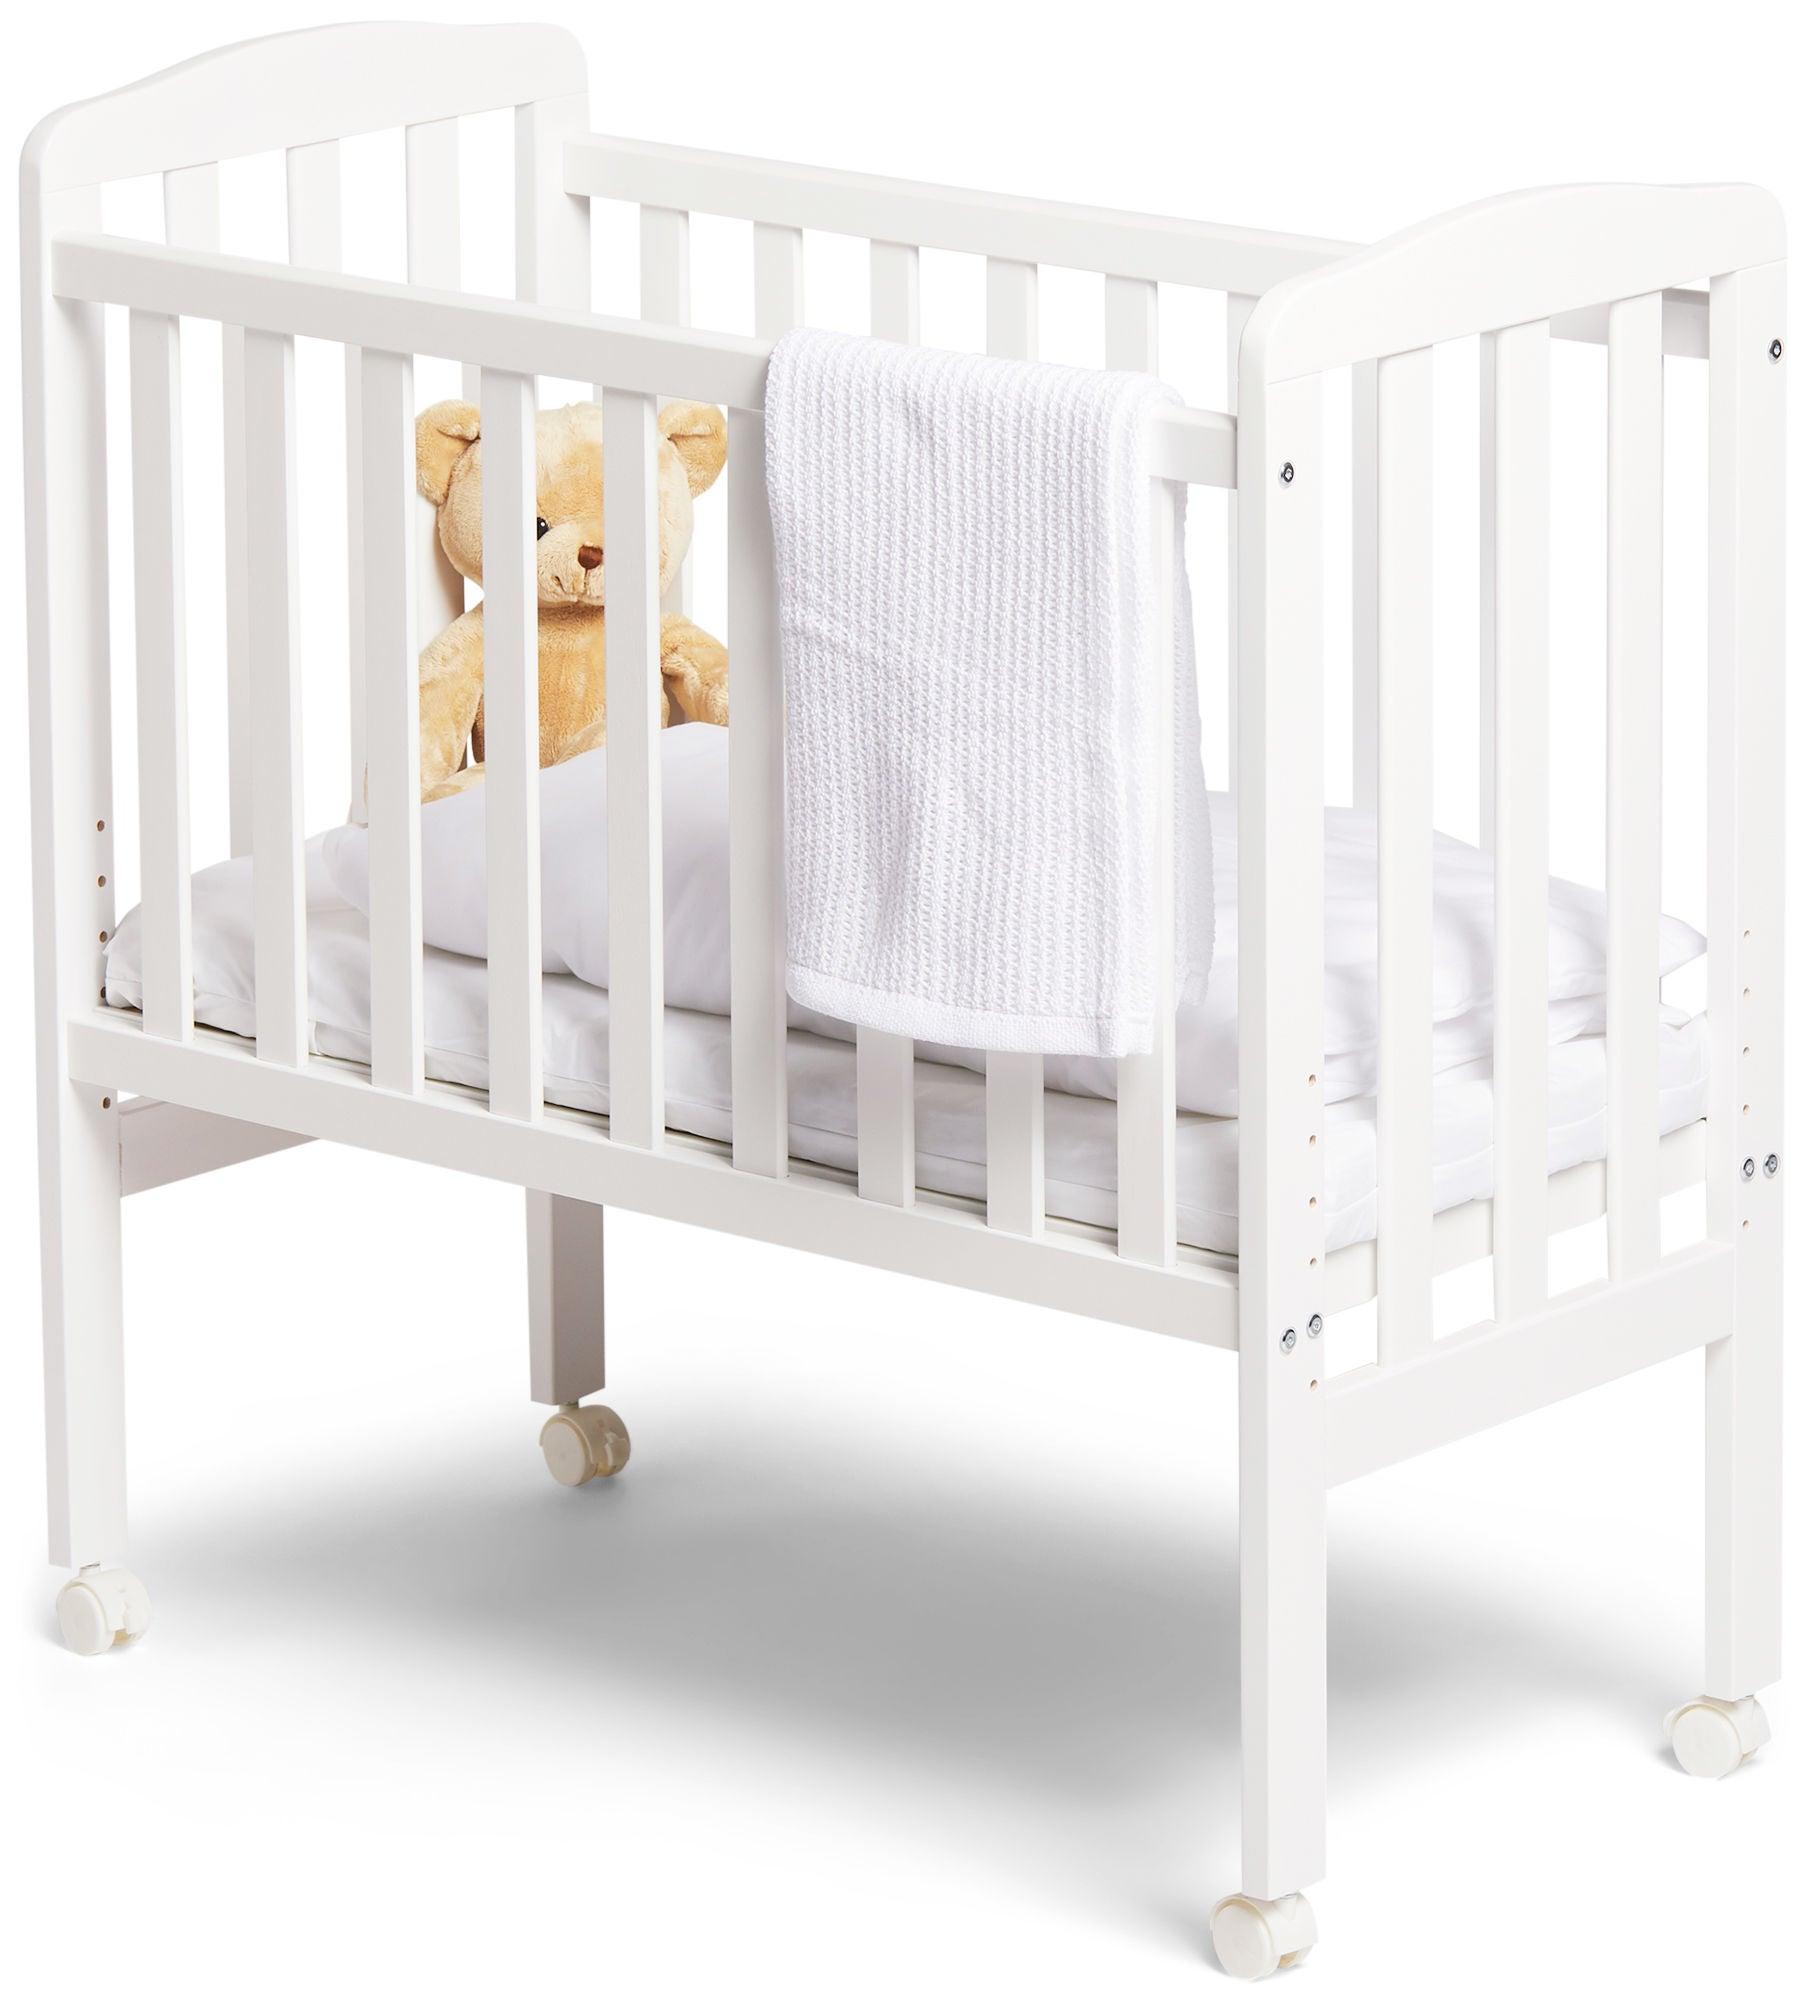 JLY Dream Bedside Crib, Valkoinen